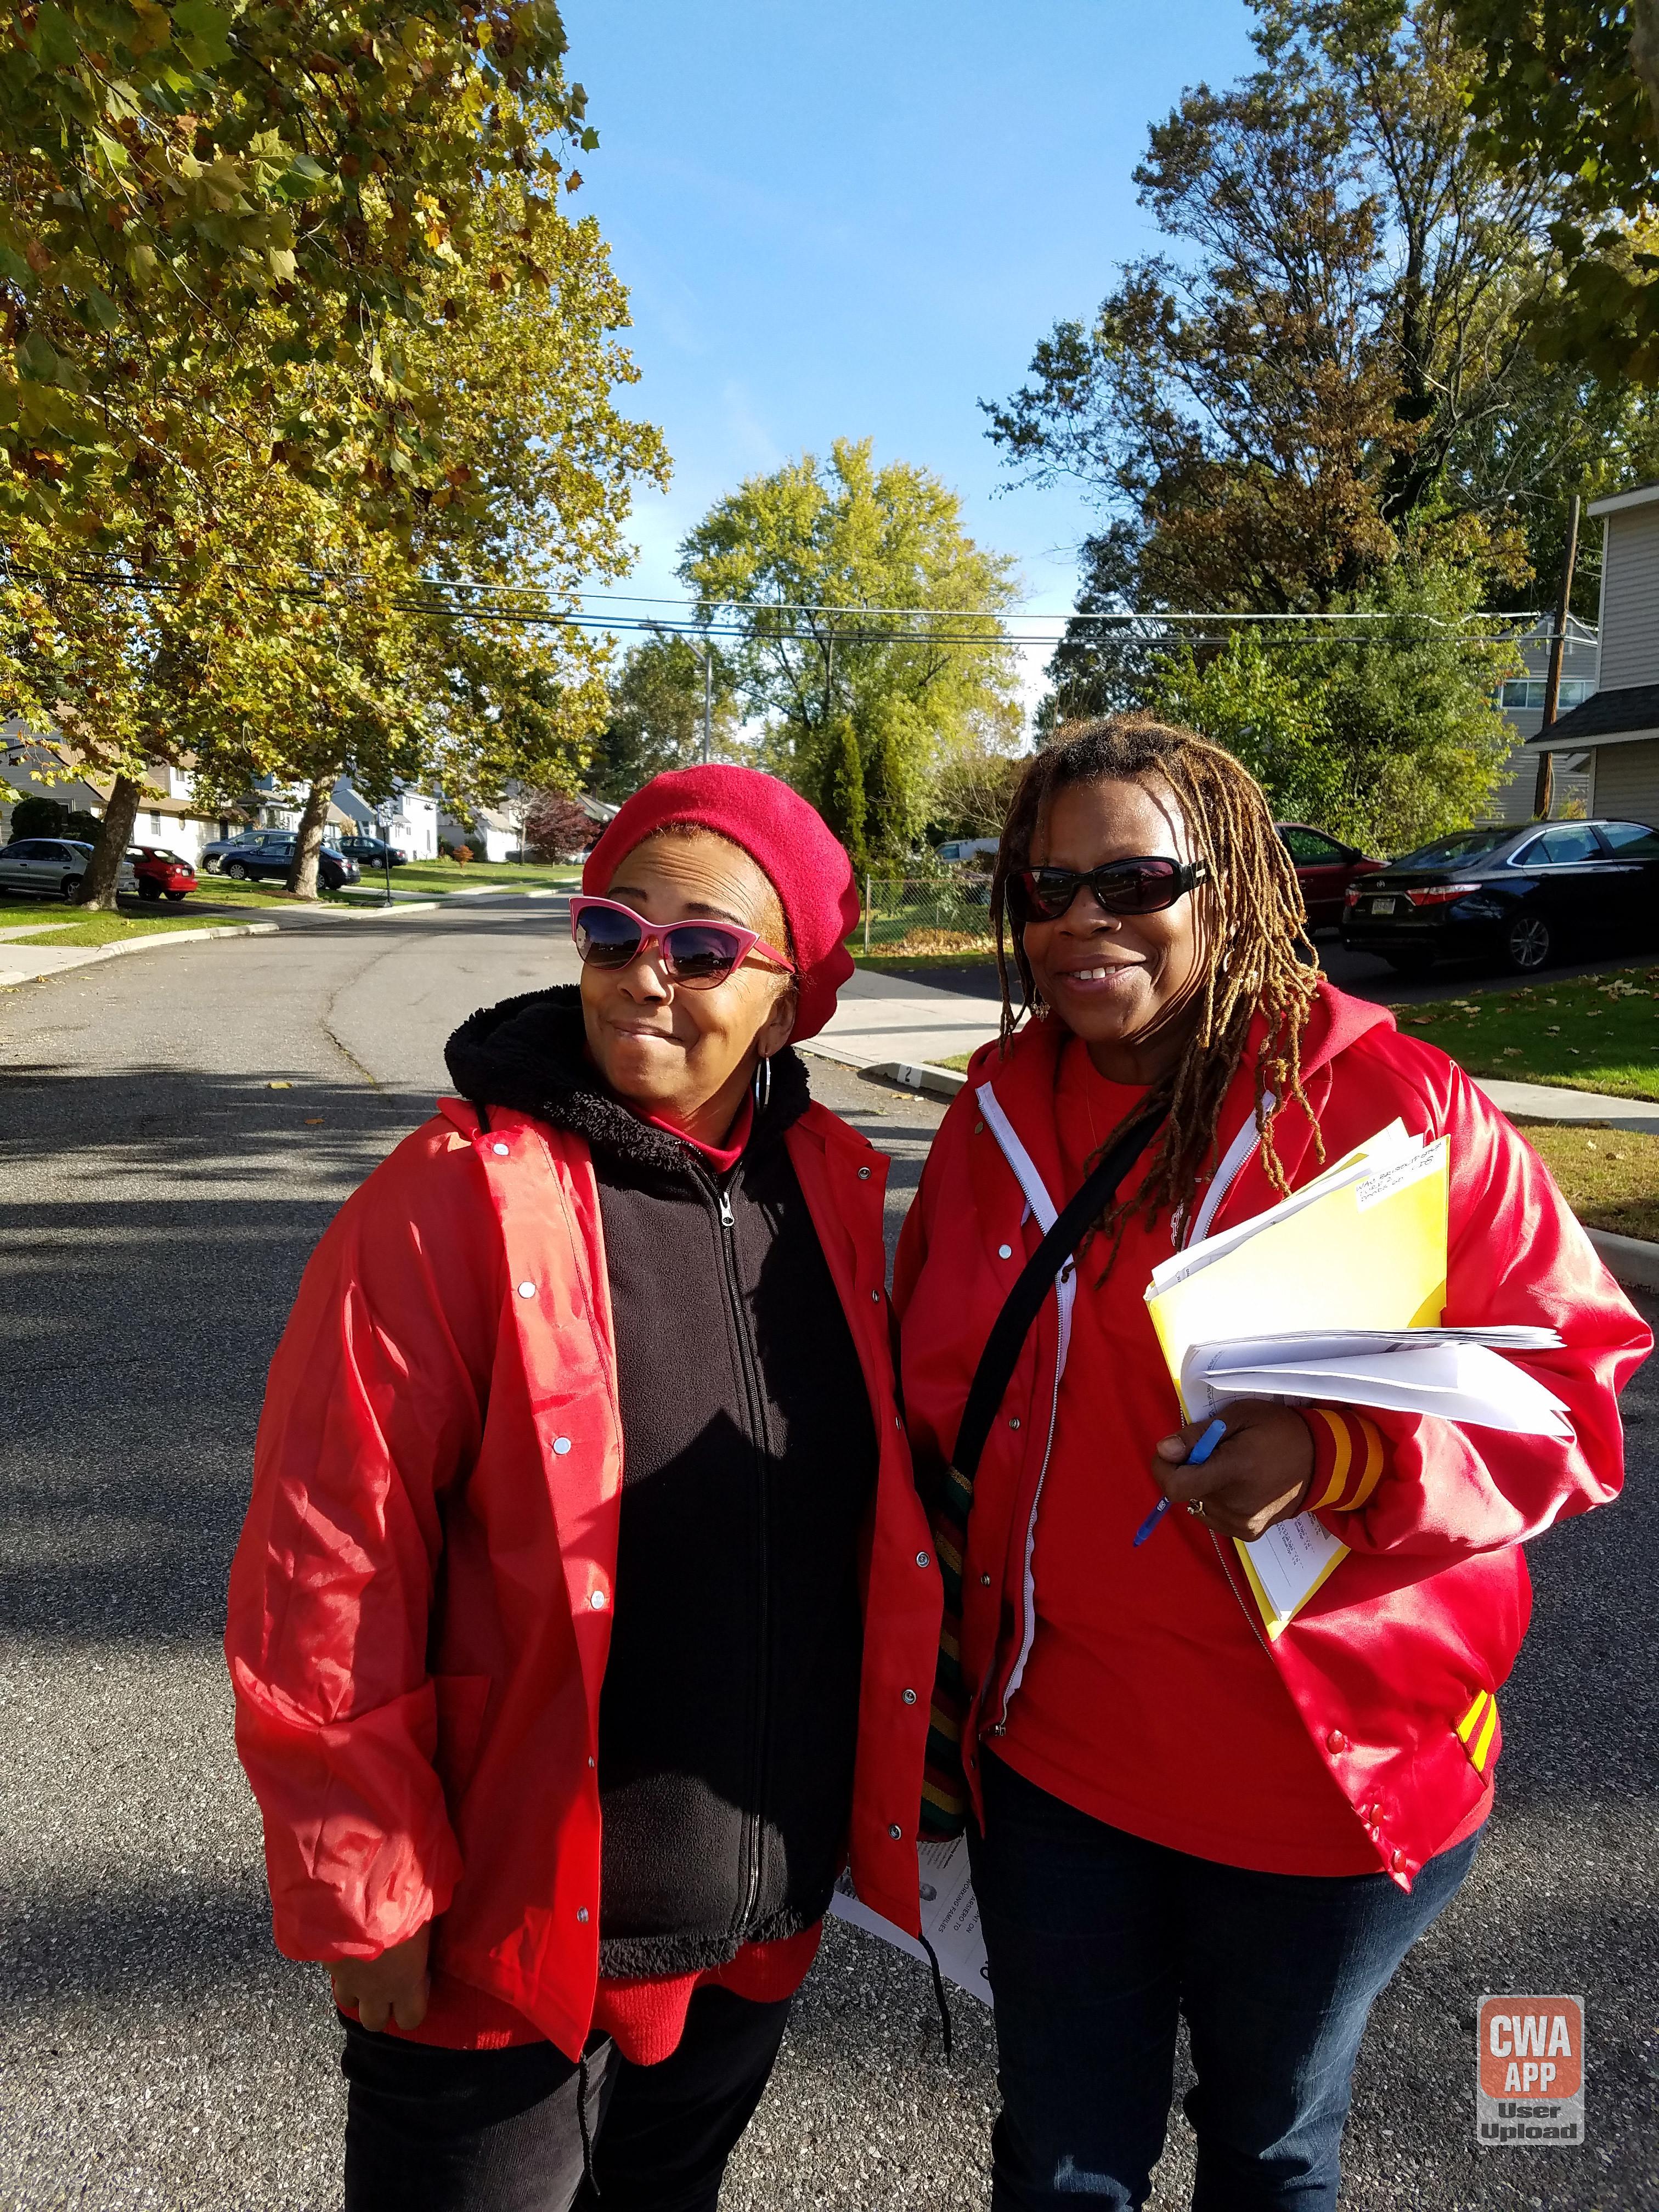 CWA Votes 2016 Labor Walk in New Jersey